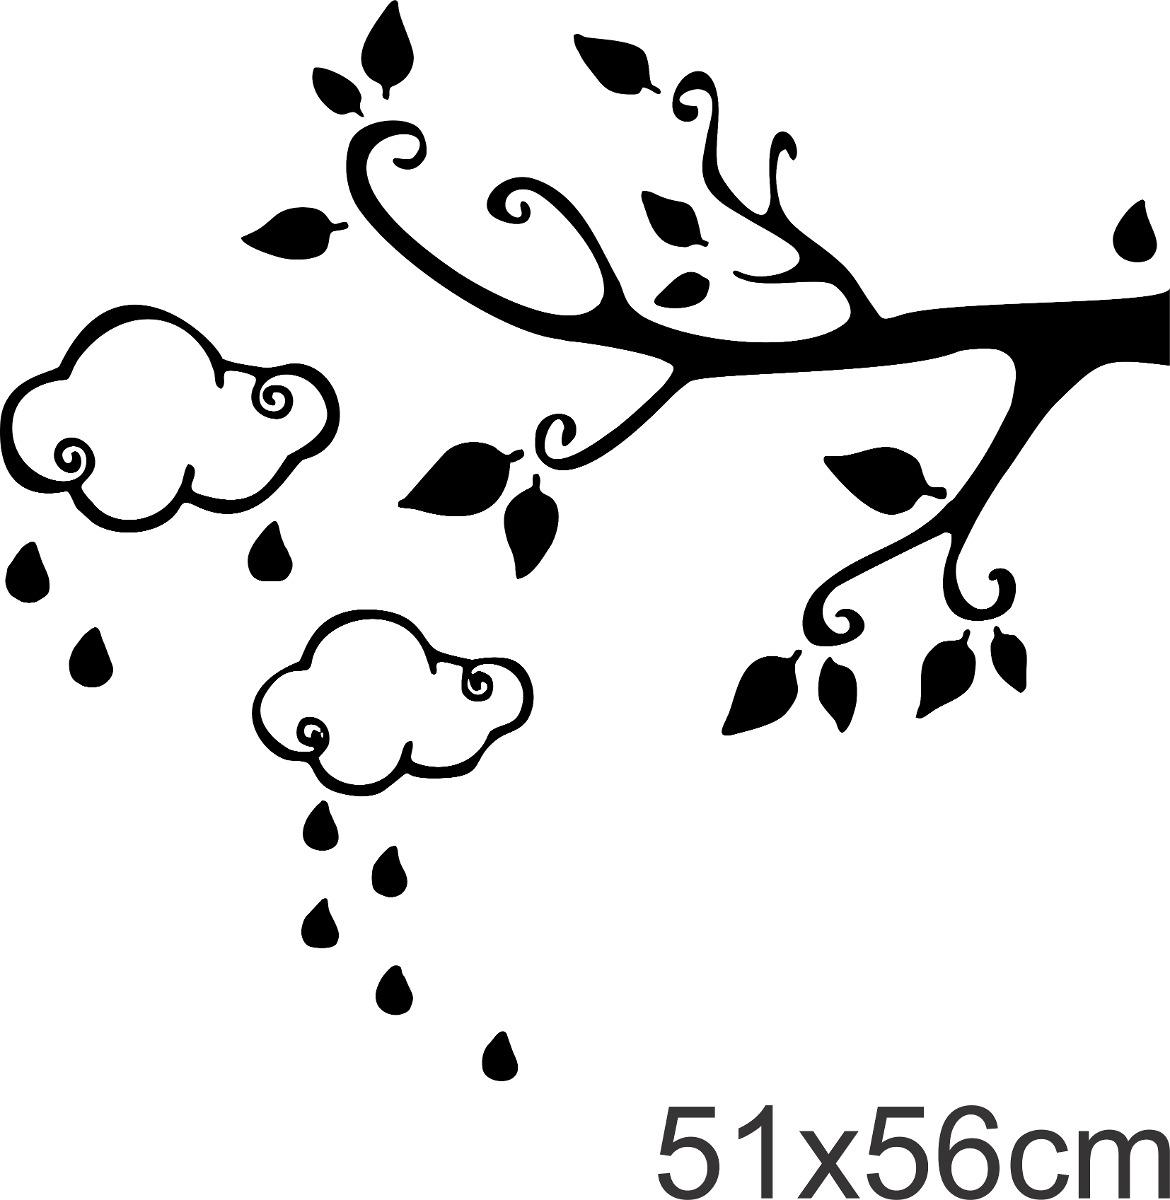 Adesivo decorativo galho nuvem infantil desenho papel - Papel decorativo infantil para paredes ...